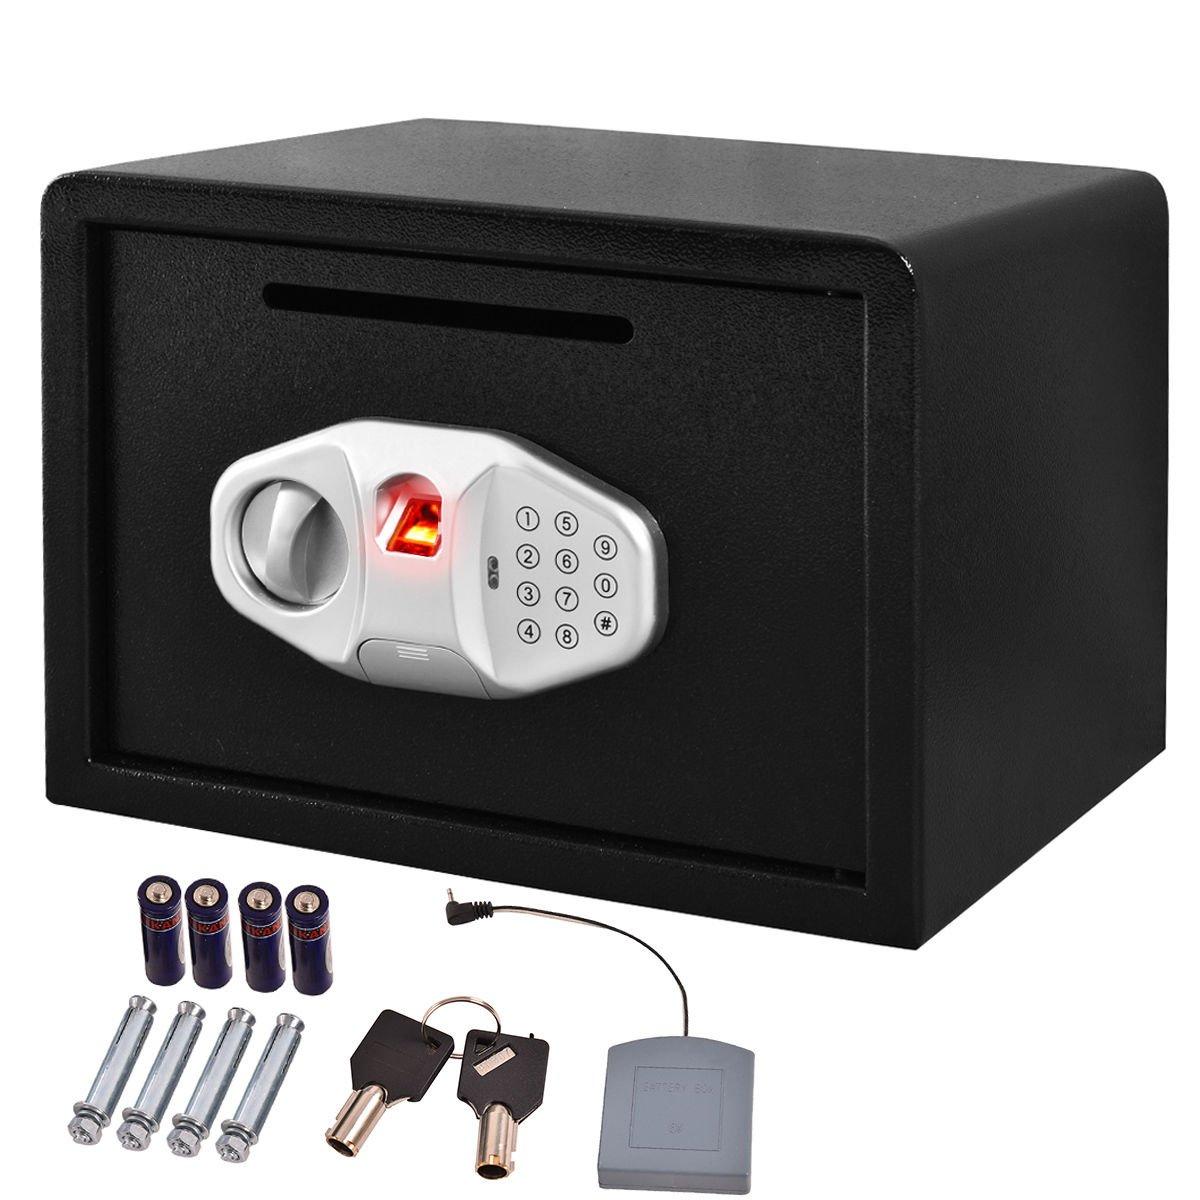 Safstar Cabinet Safes Biometric Fingerprint Electronic Digital Keypad Lock Security Box for Cash Jewelry Passport Guns Collectibles (FS Fingerprint: 9.8'' x 13.7'' x 9.8'') by S AFSTAR (Image #1)